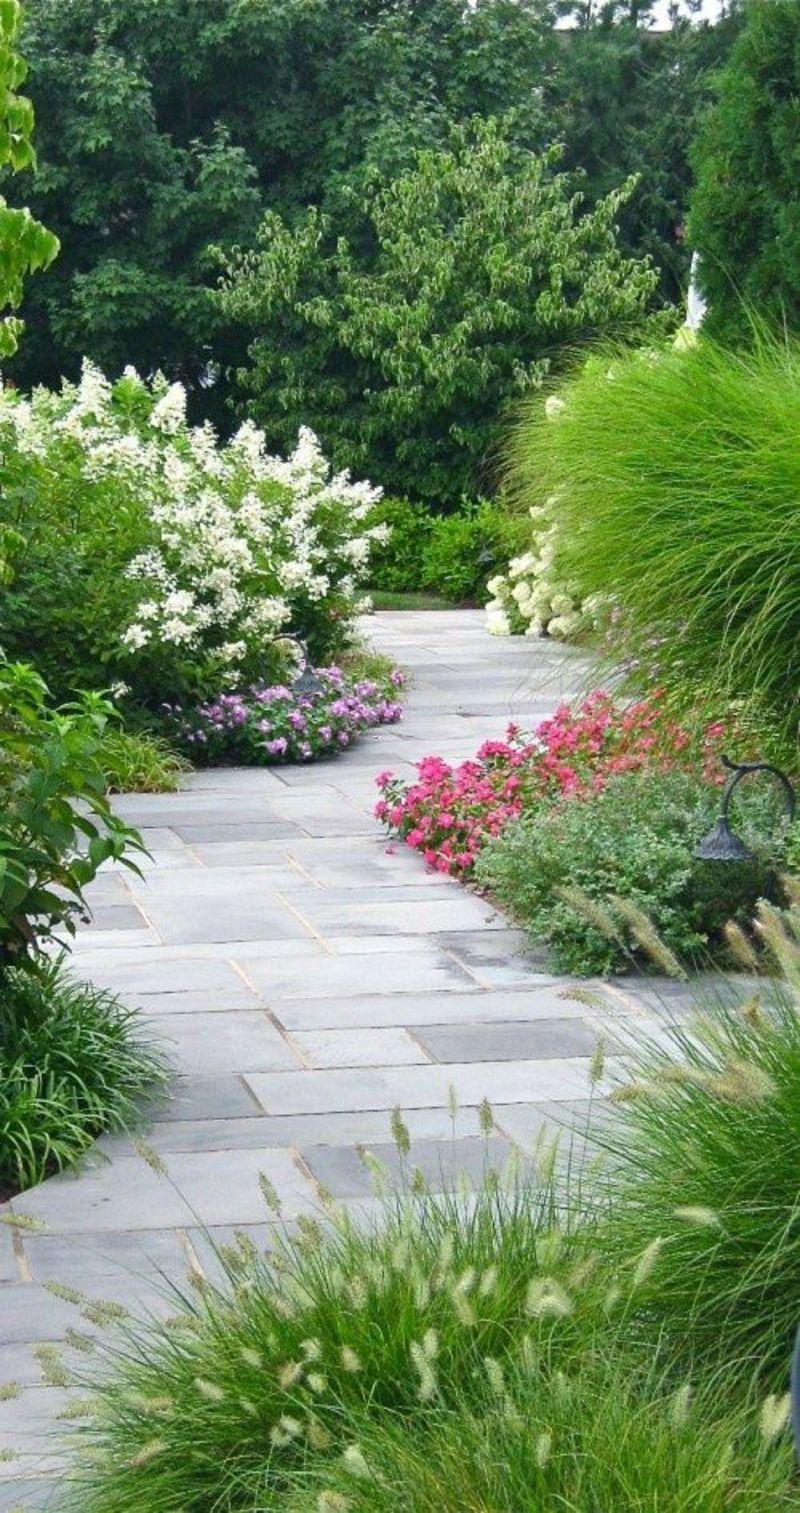 kreative Gaertenideen Gartenarbeit Gartenweg Stein Gartenpflanzen